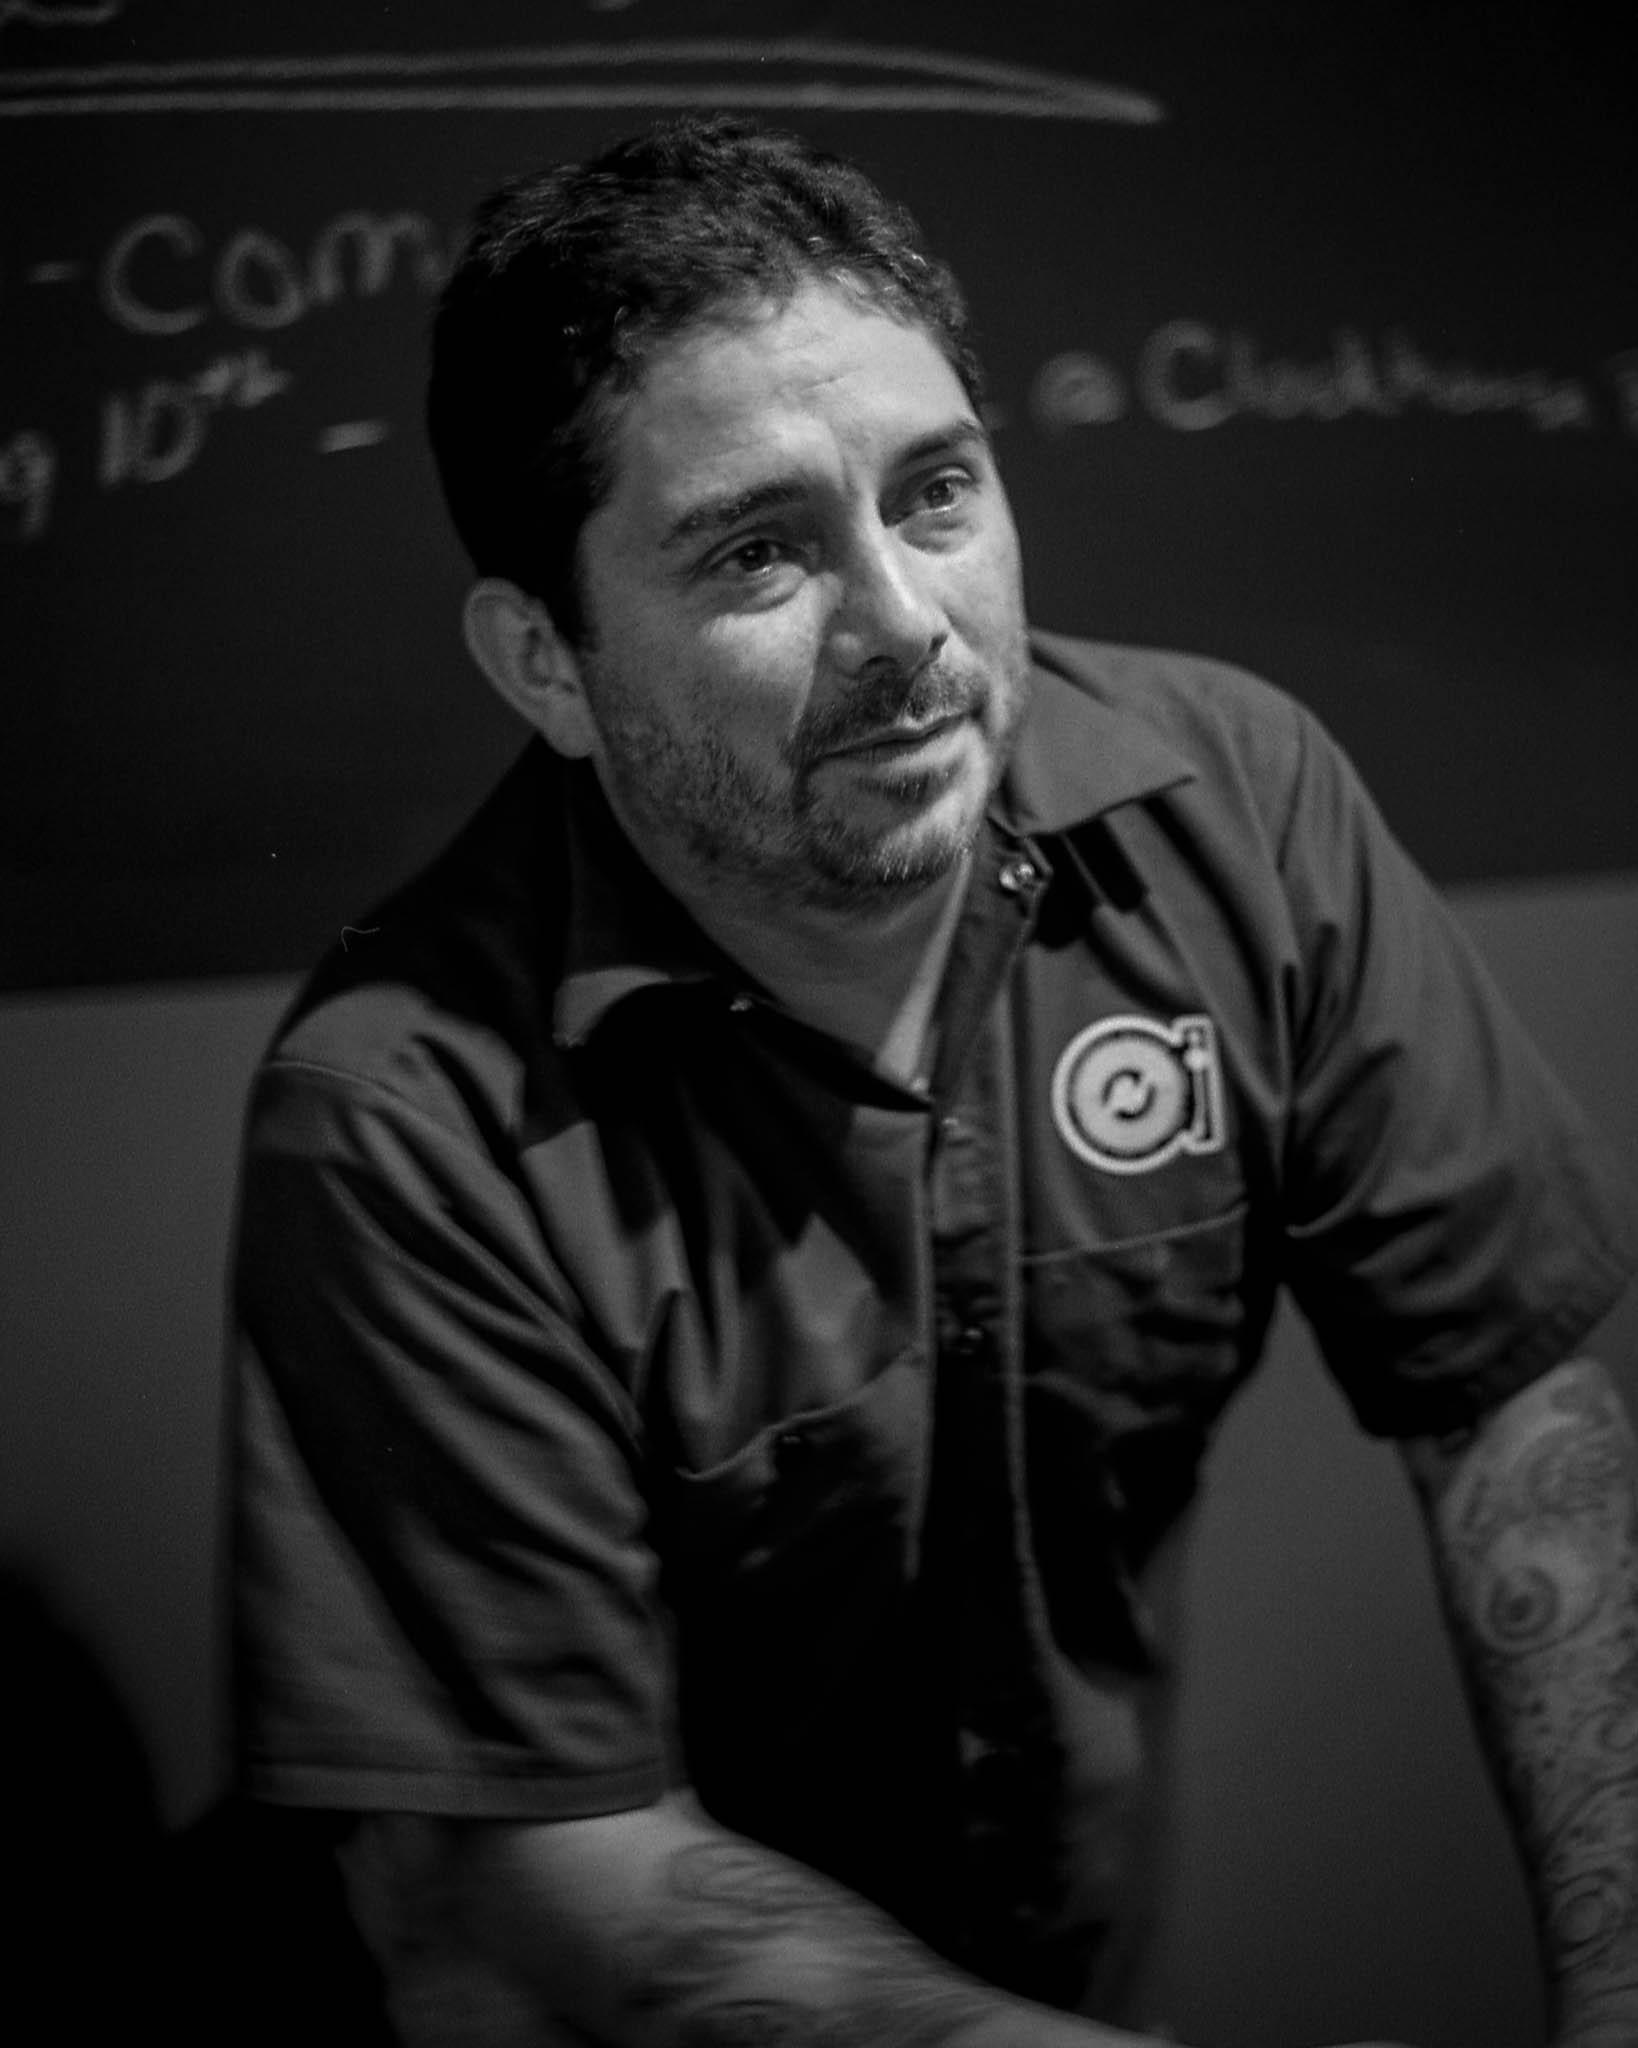 Jeremy, owner of Analog Vault